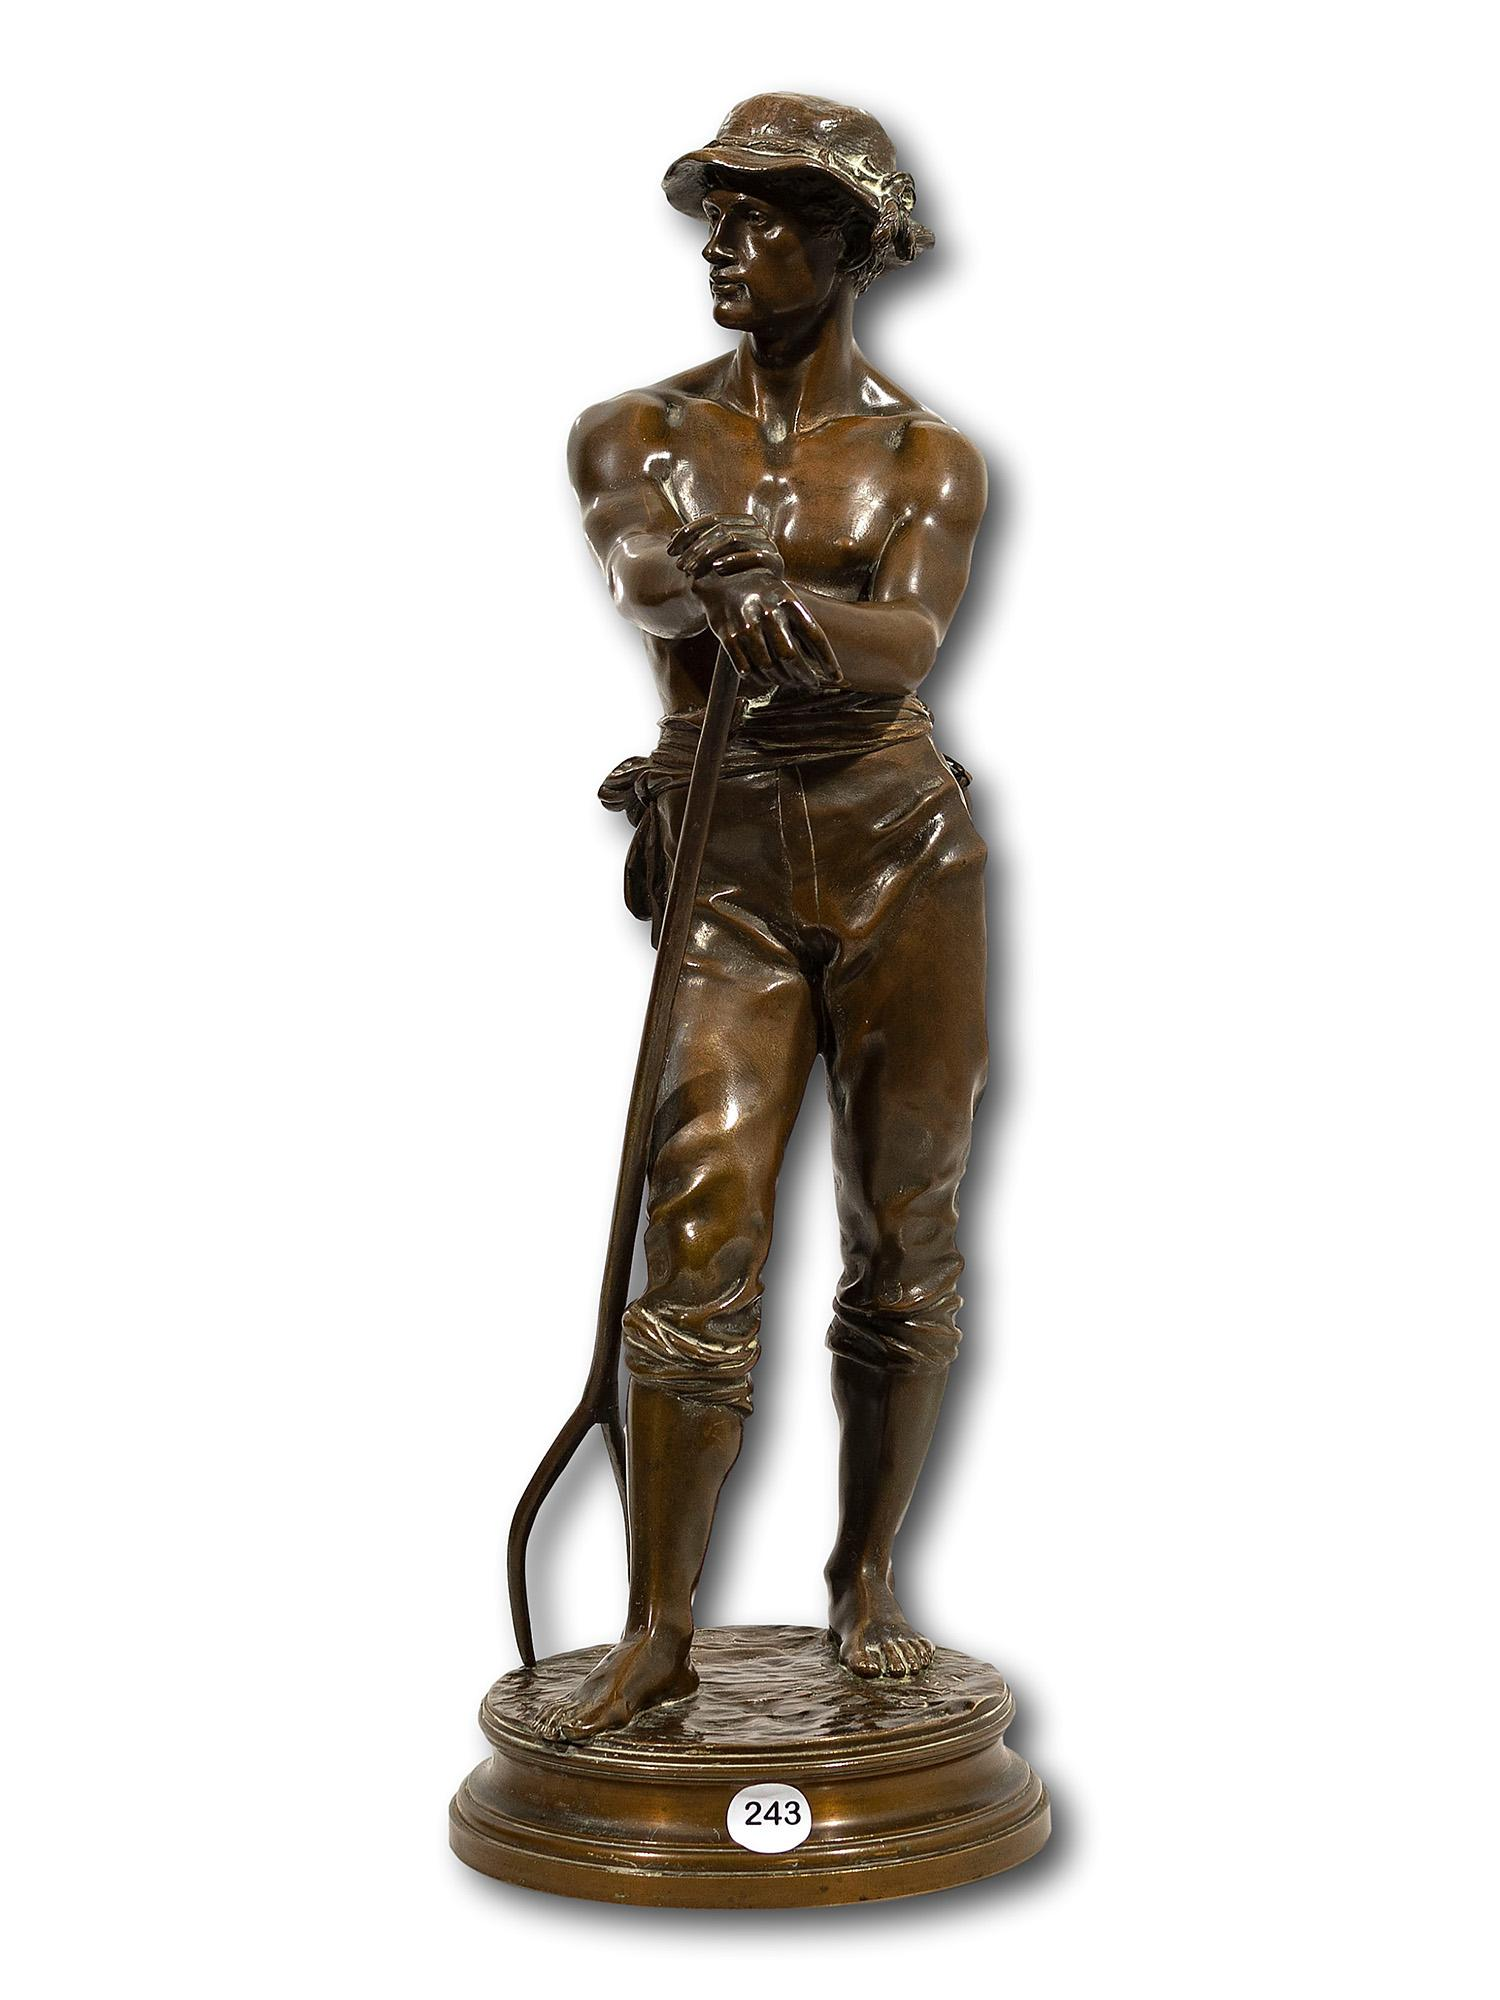 "After Charles Octave Levy (French 1820 - 1899) Bronze, Farm Worker with Flask & Pitchfork, Signed & Stamped ""Bronze Garanti au Titre/L.V Deposee"", 43cm including base"